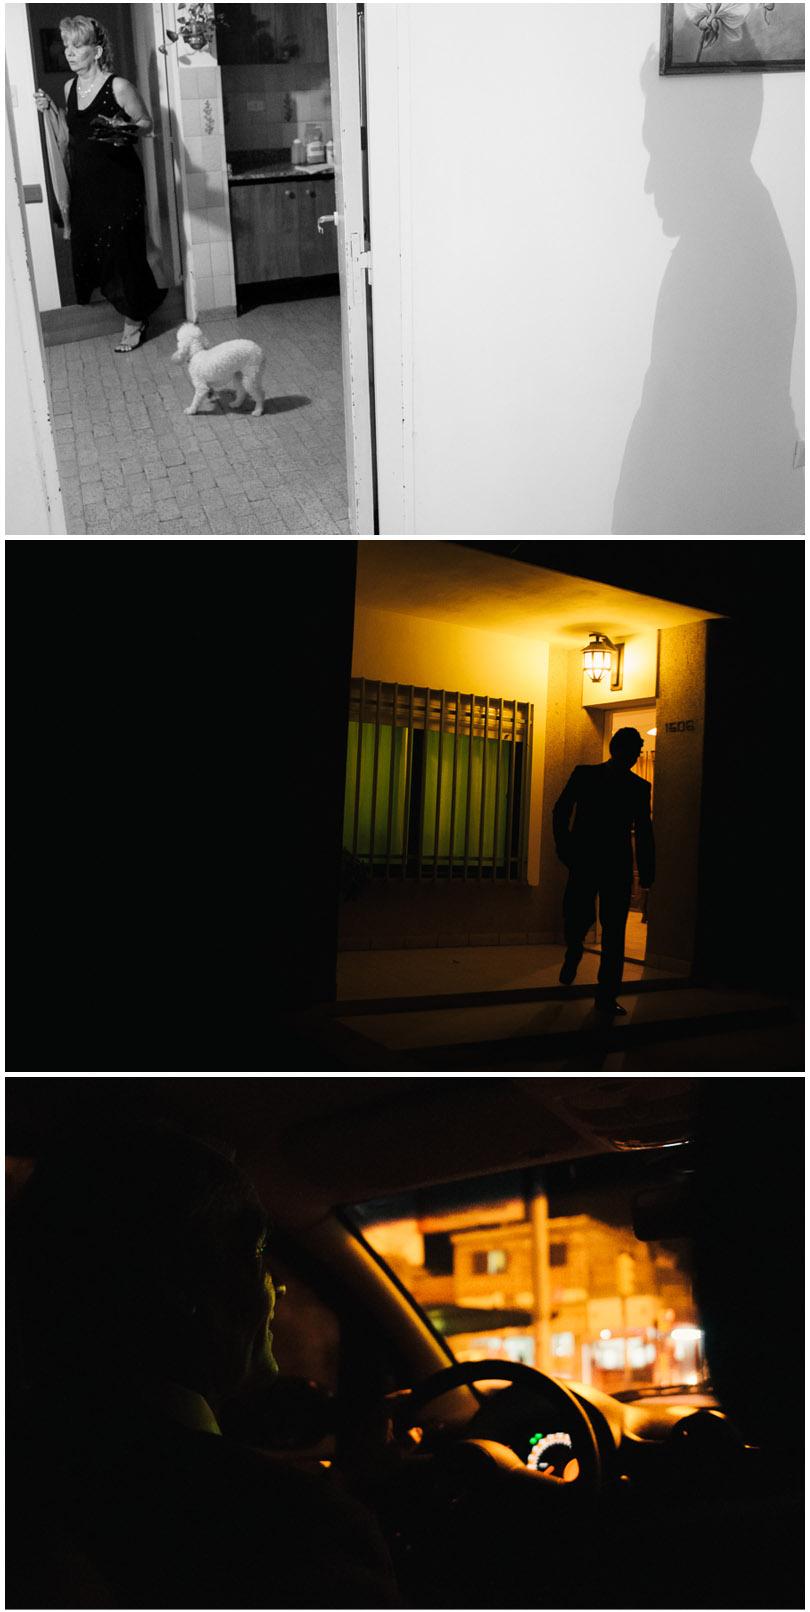 fotografos de casamientos cordoba argentina (6).jpg